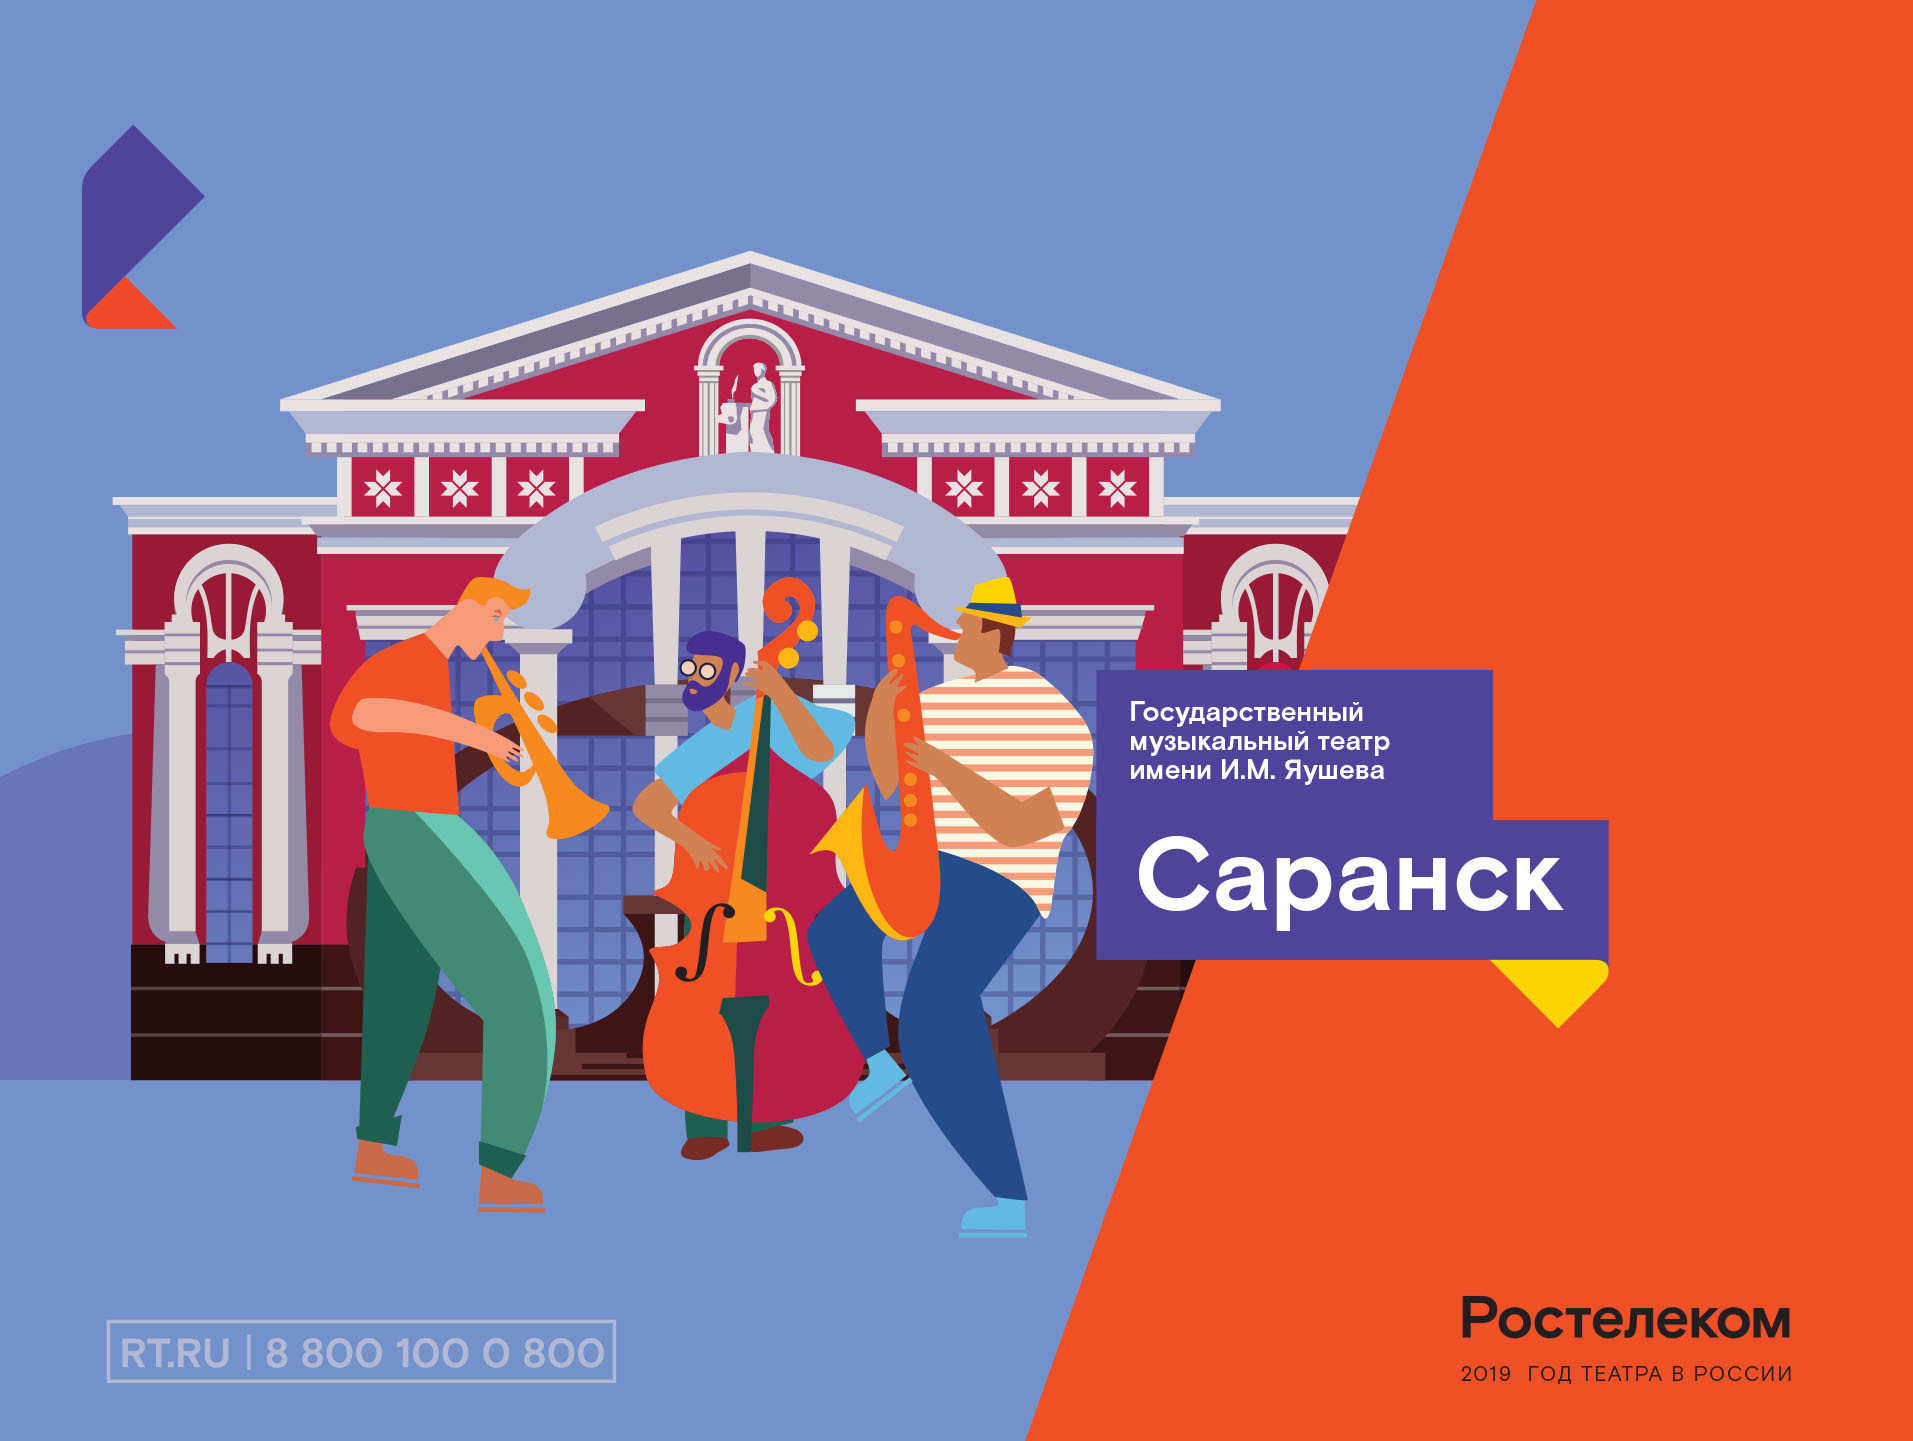 Axana zasorina rostelecom1 copy 9